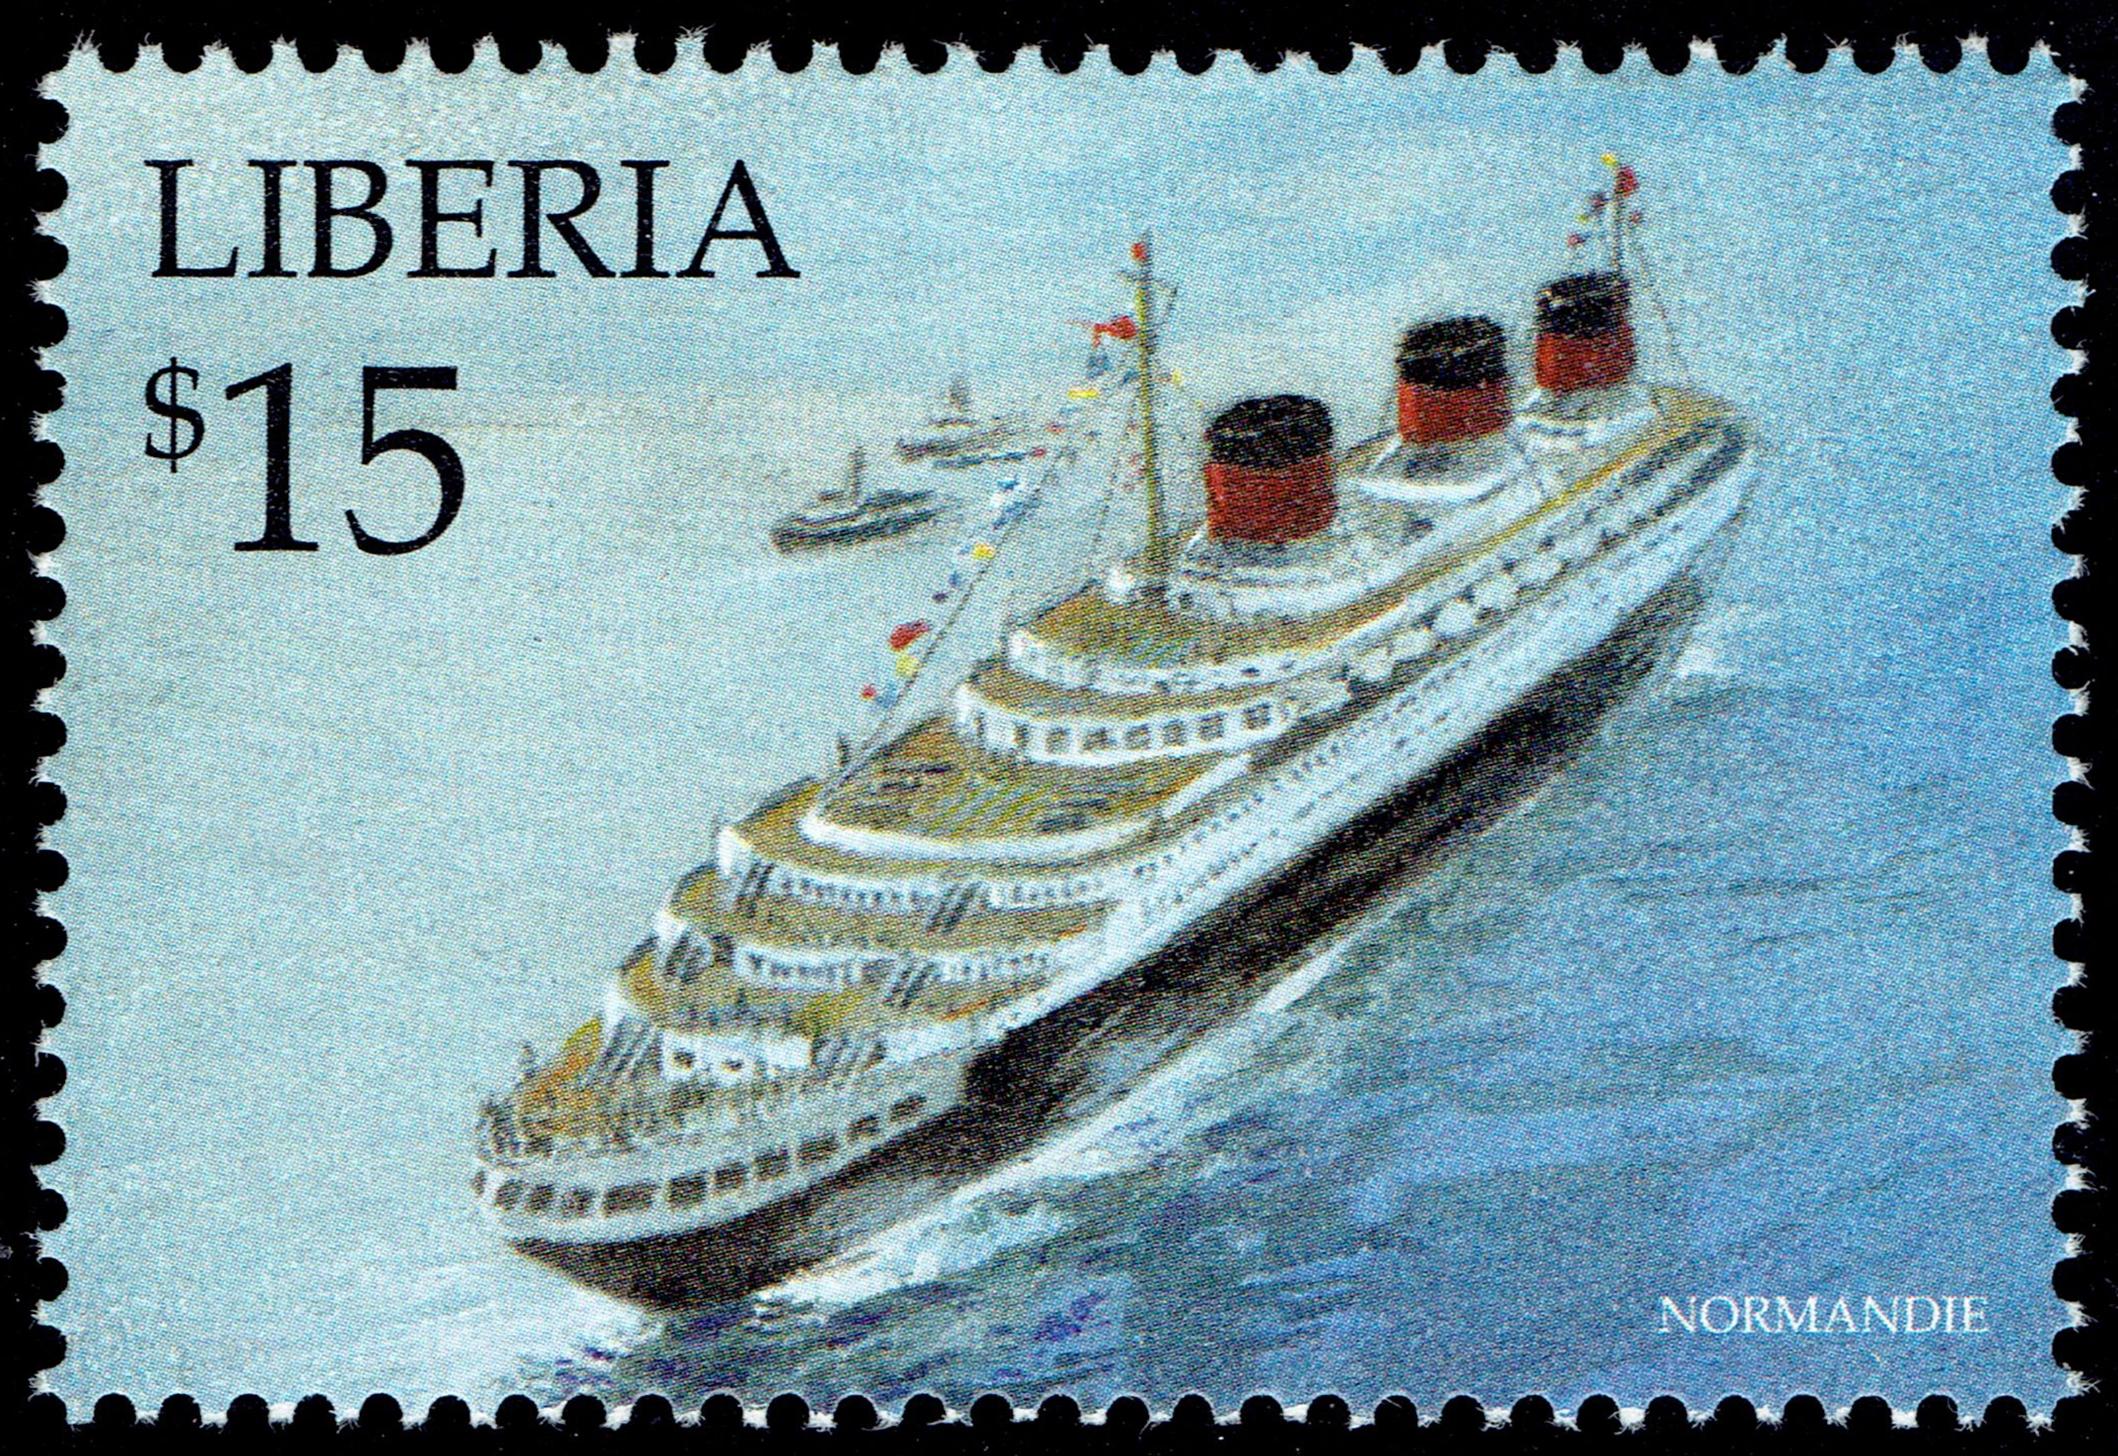 Liberia - StampWorld #3912 (2001)